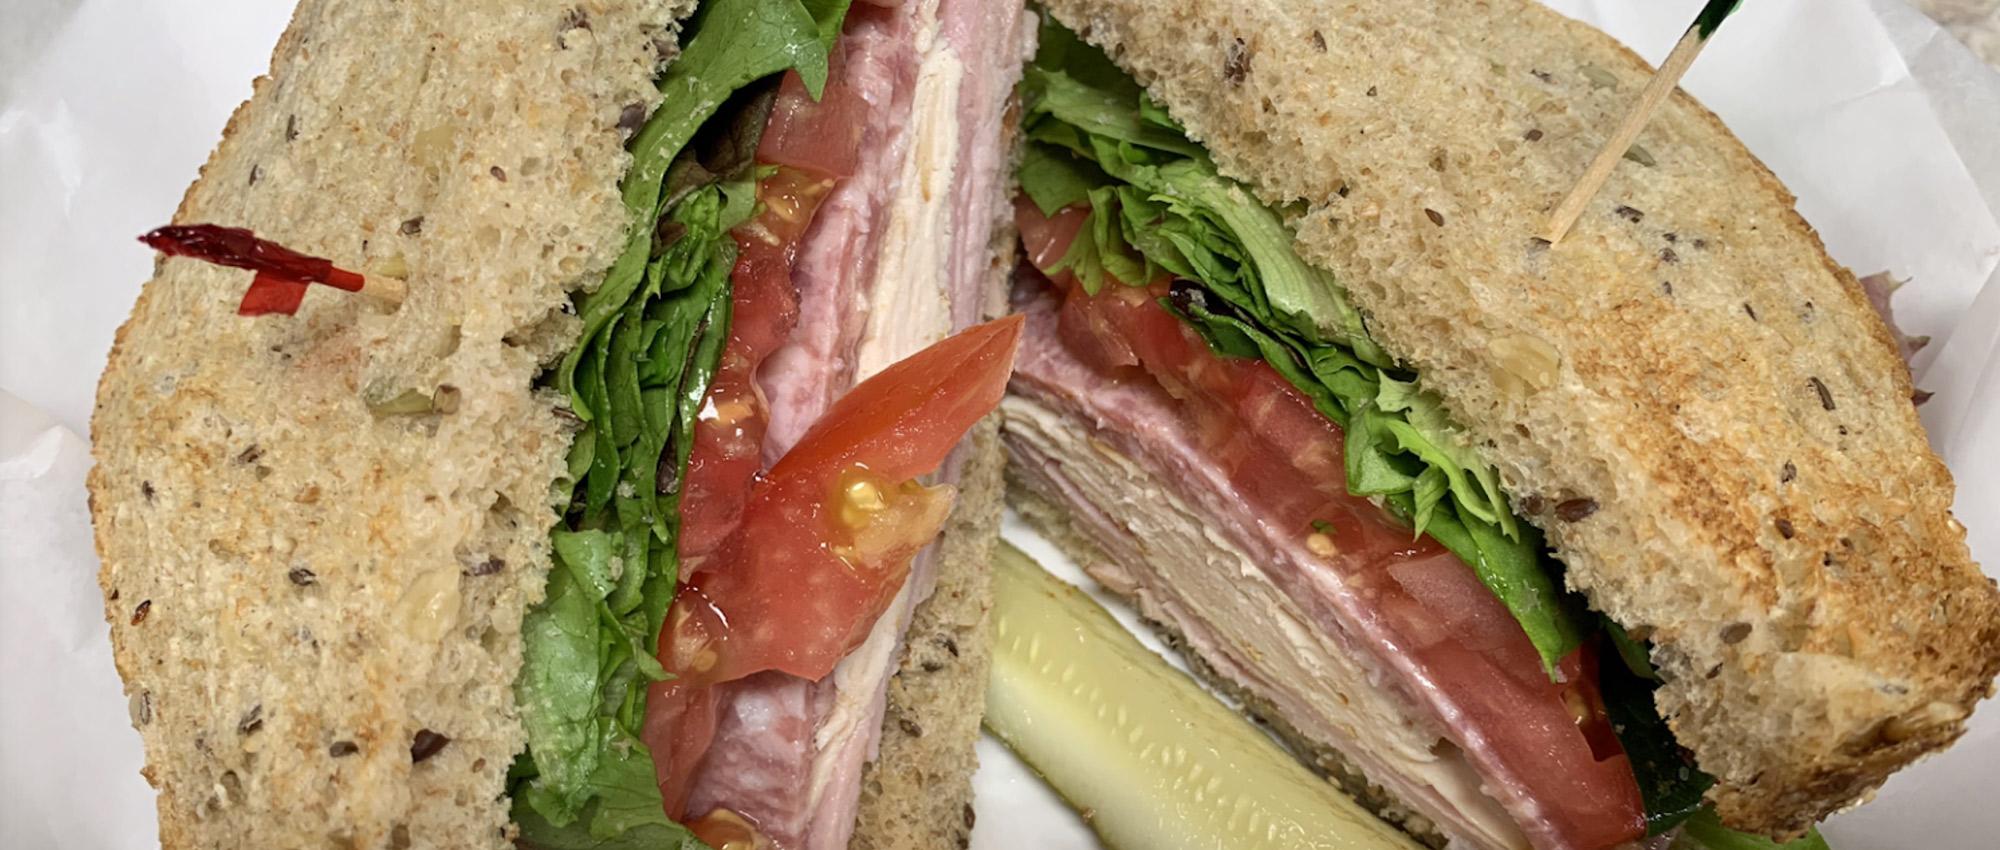 Fast & Fresh Soups, Salads, Sandwiches